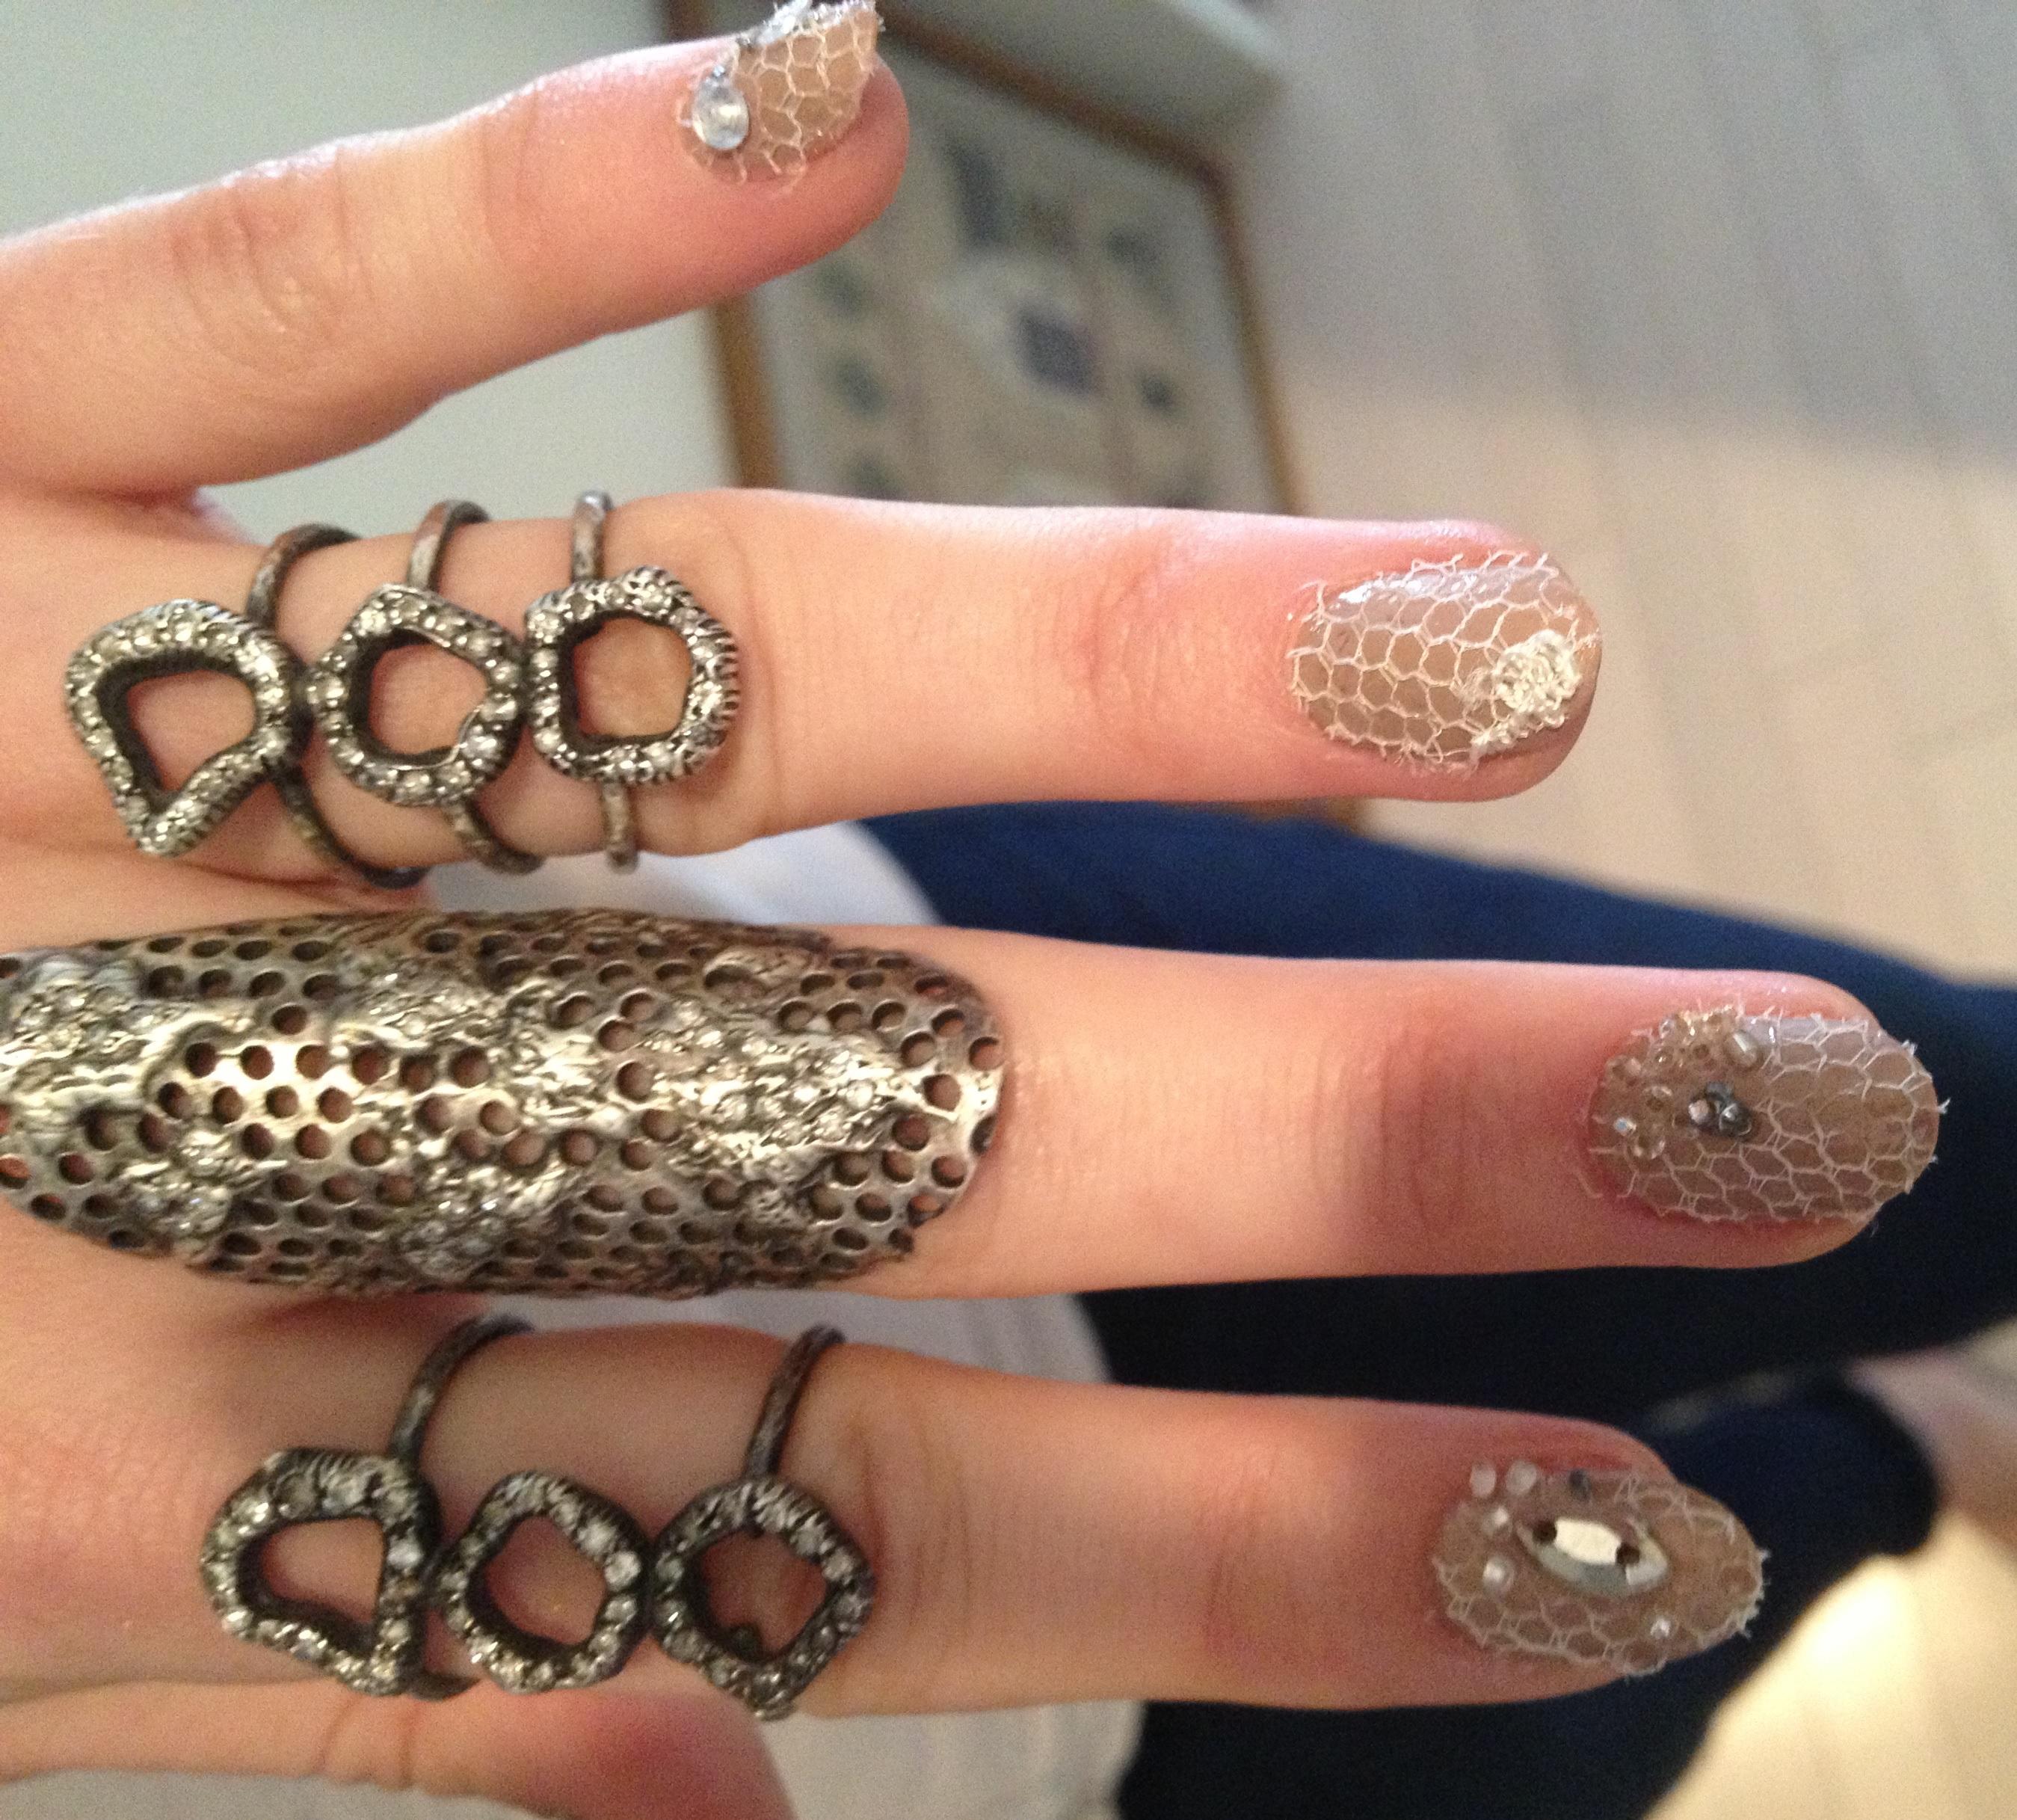 Emmy Rossum Lace Punk Nails Met Gala